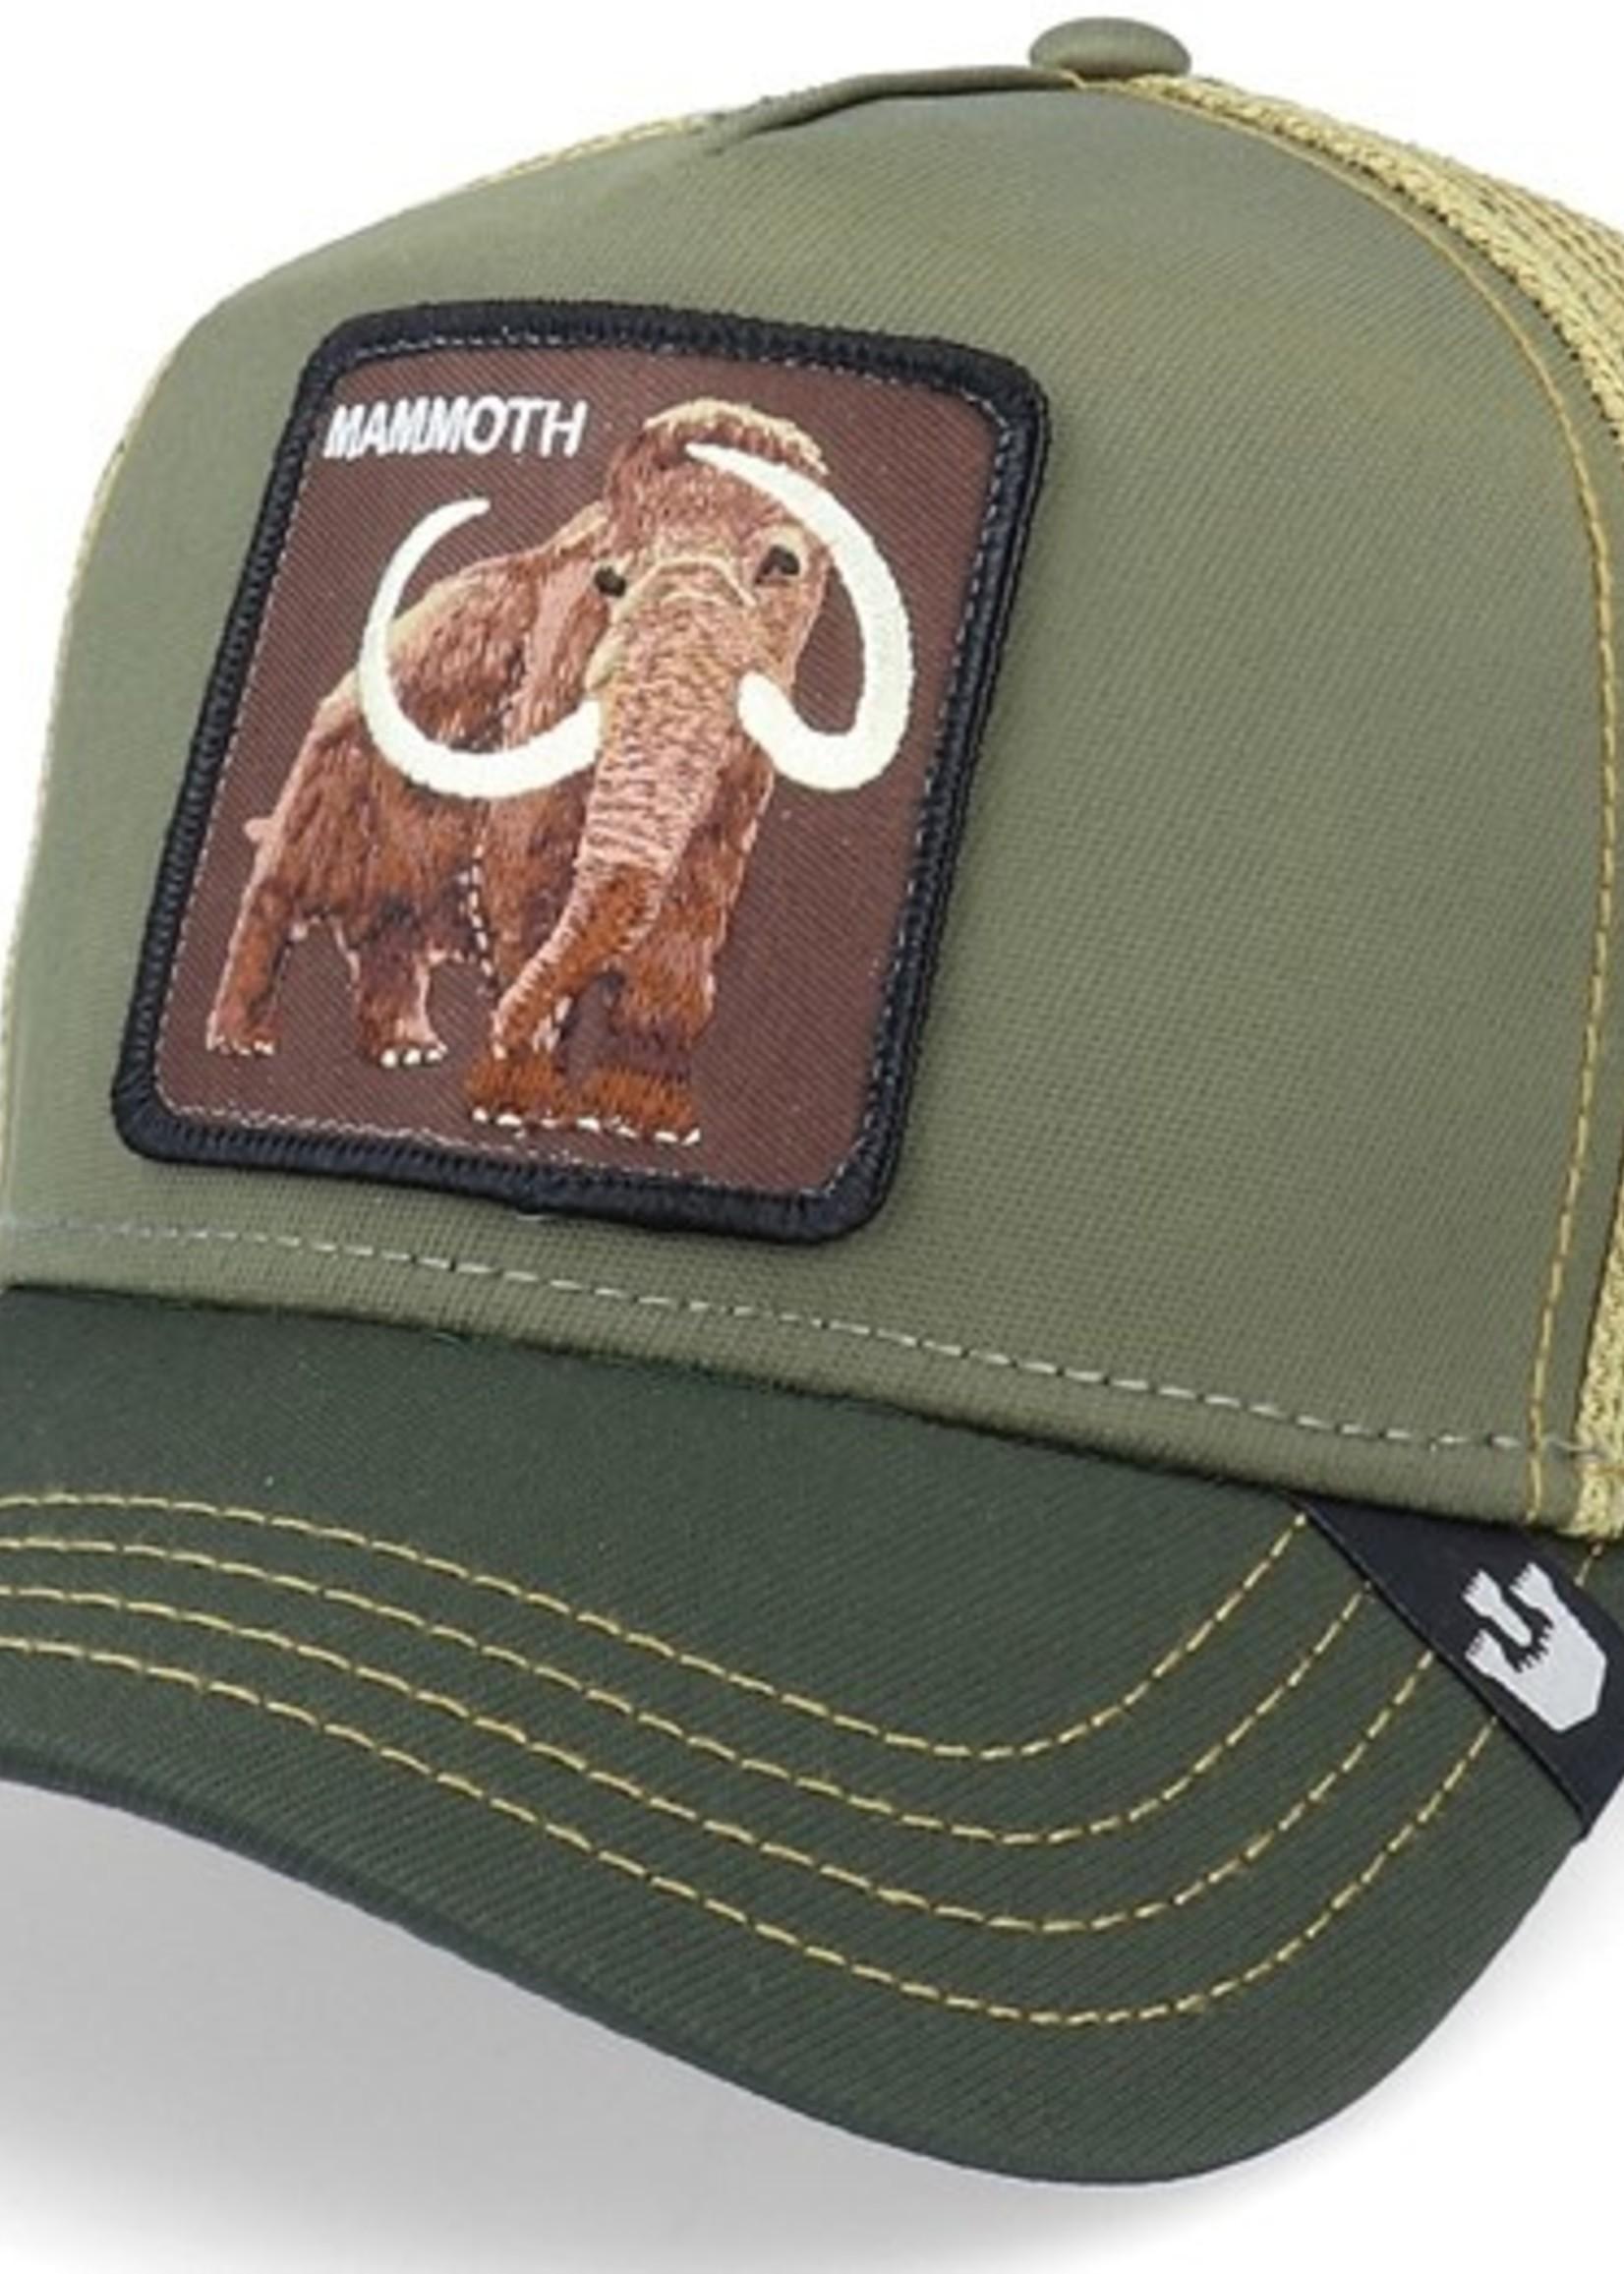 Goorin Bros Wooly Mammoth Cap